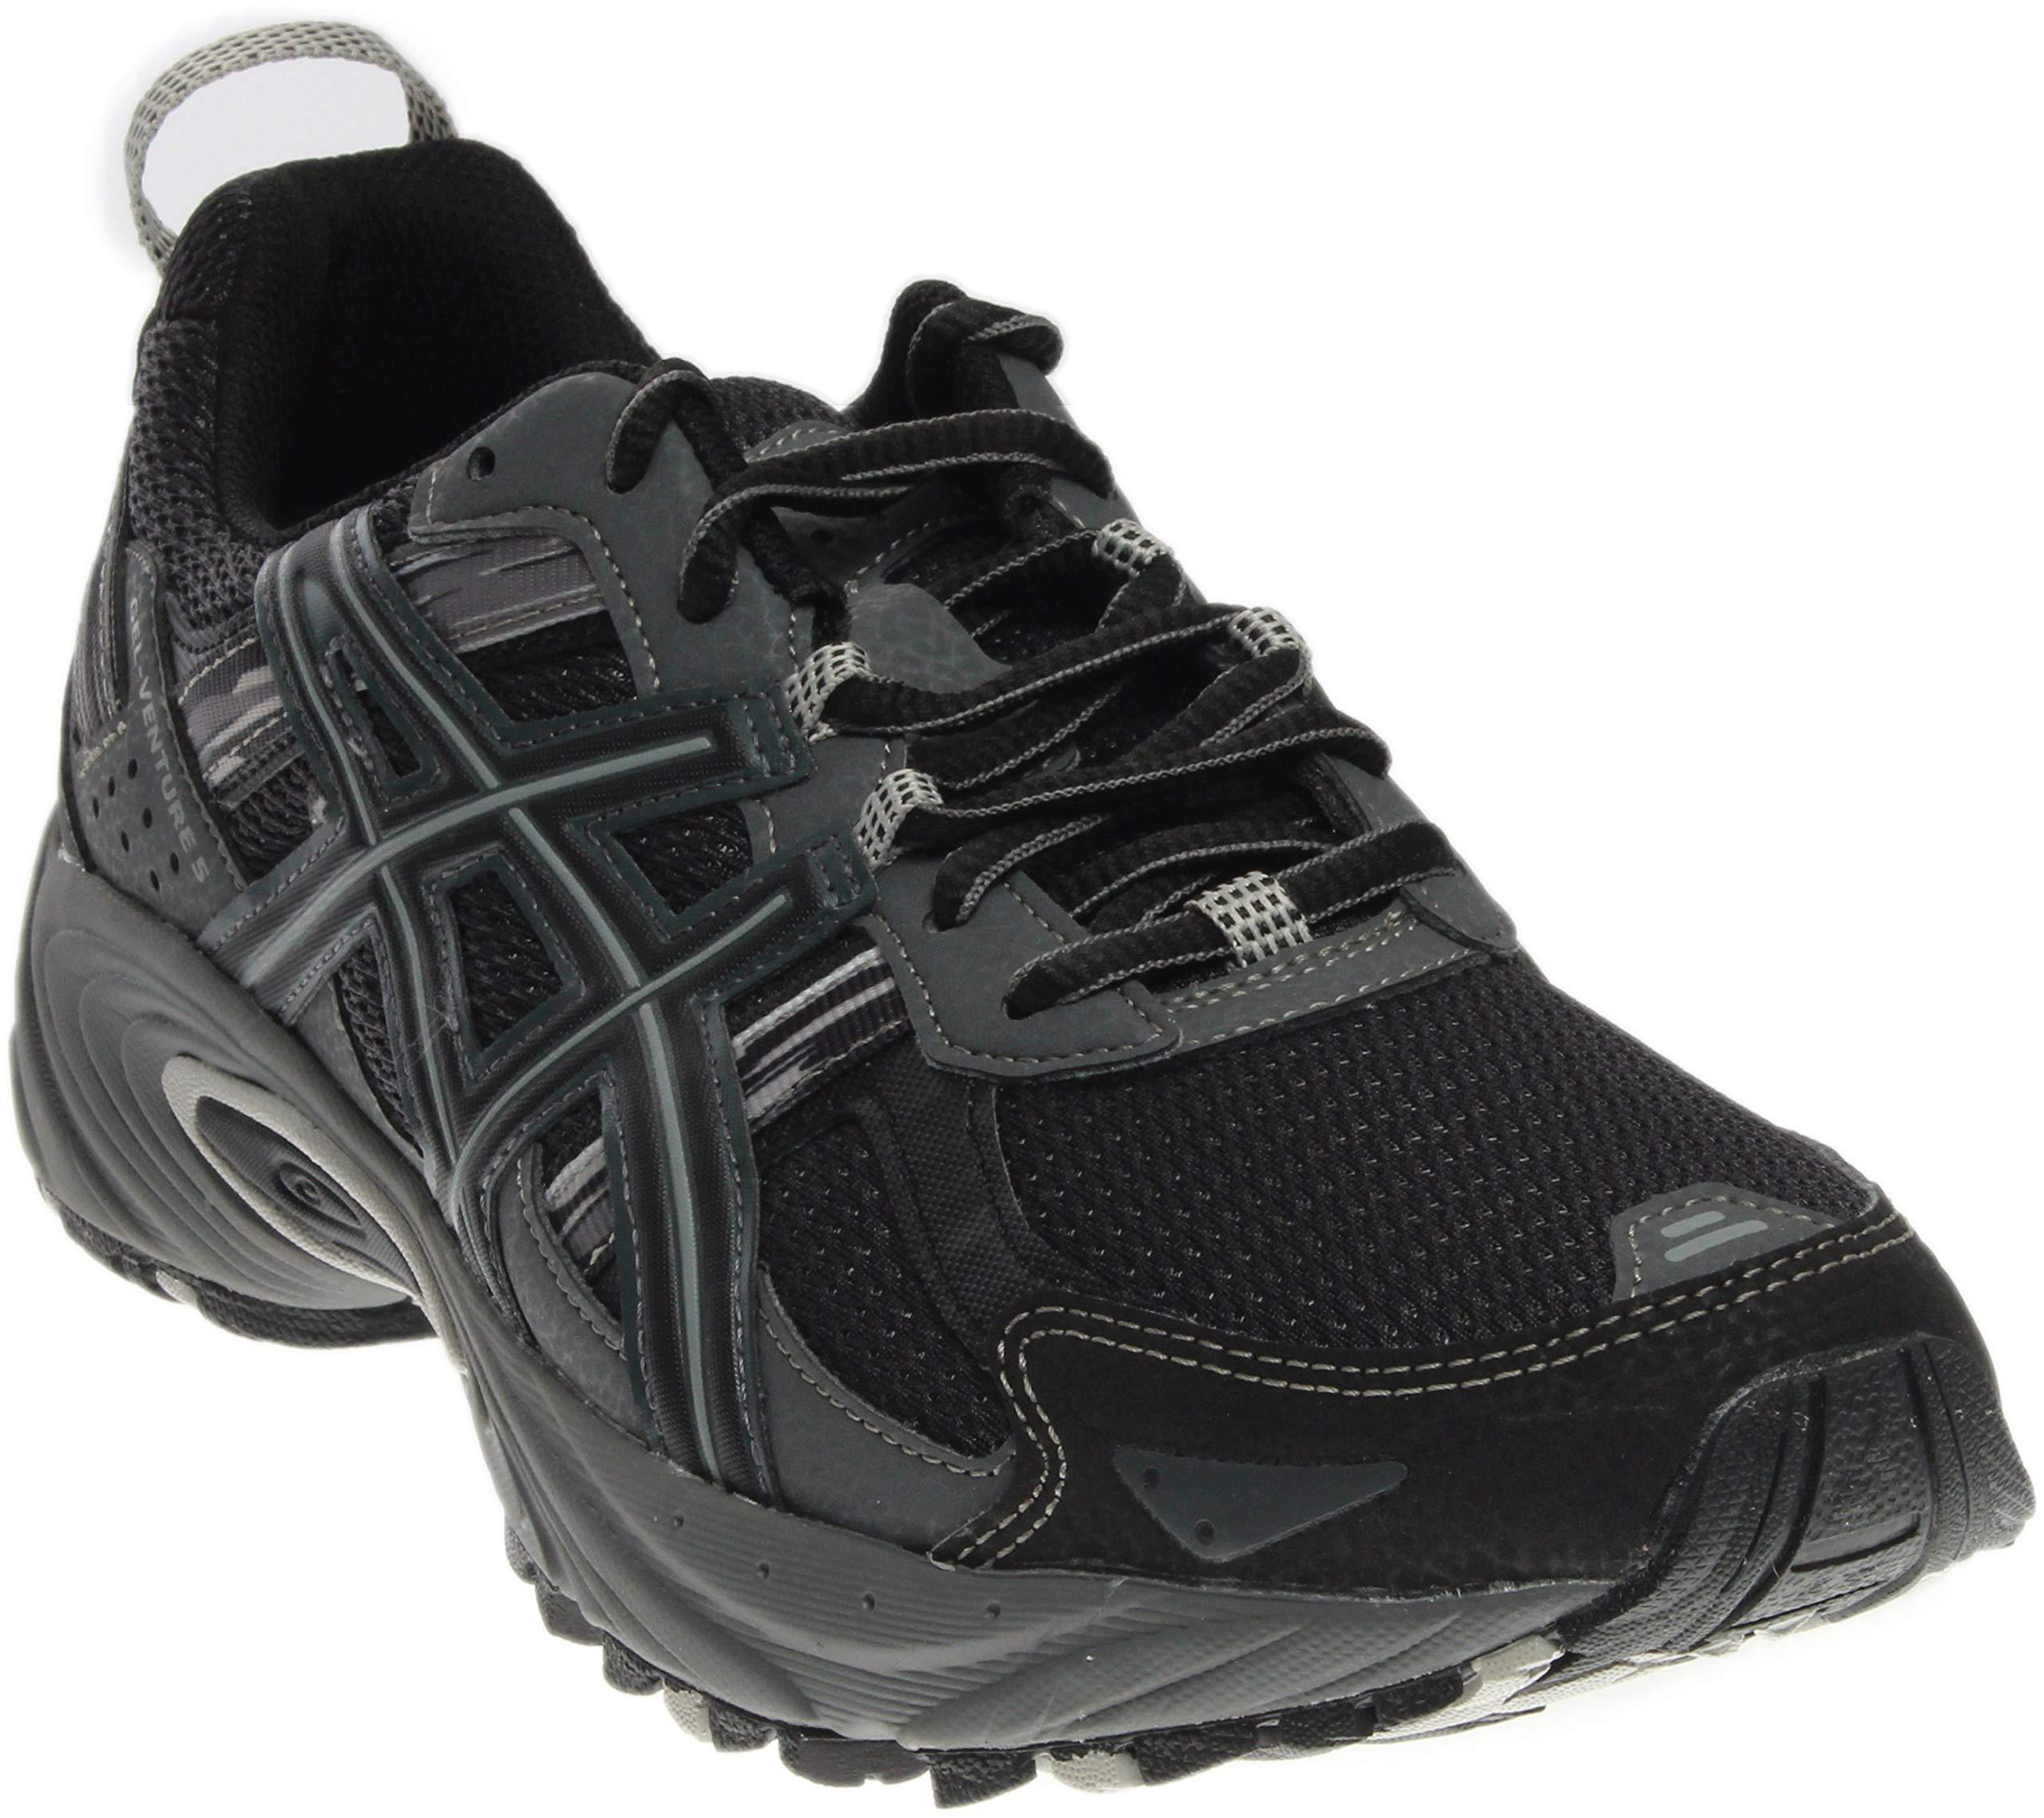 ASICS Men's Gel-Venture 5-M, Black/Onyx/Charcoal, 7 M US